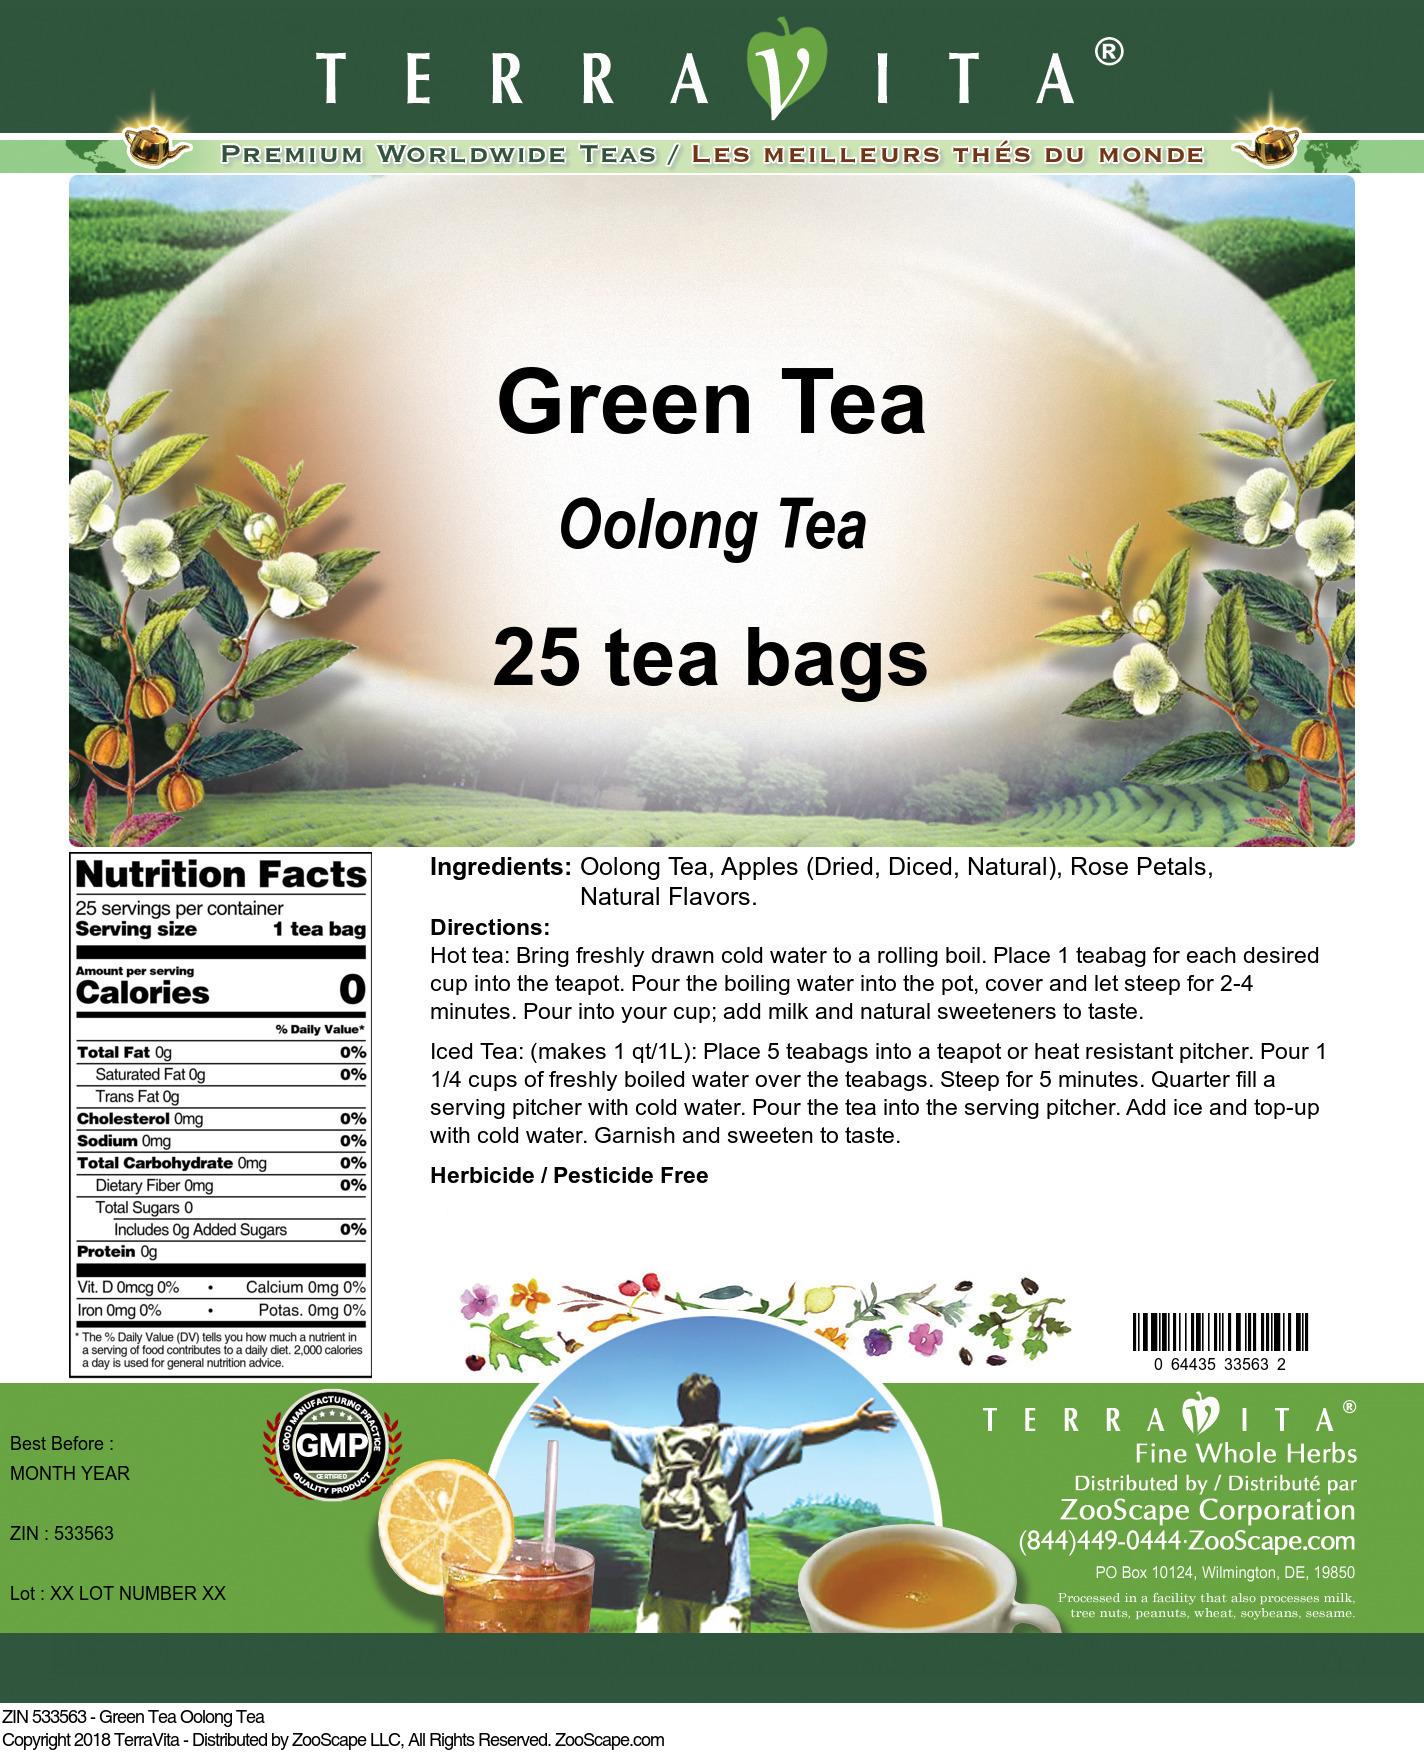 Green Tea Oolong Tea